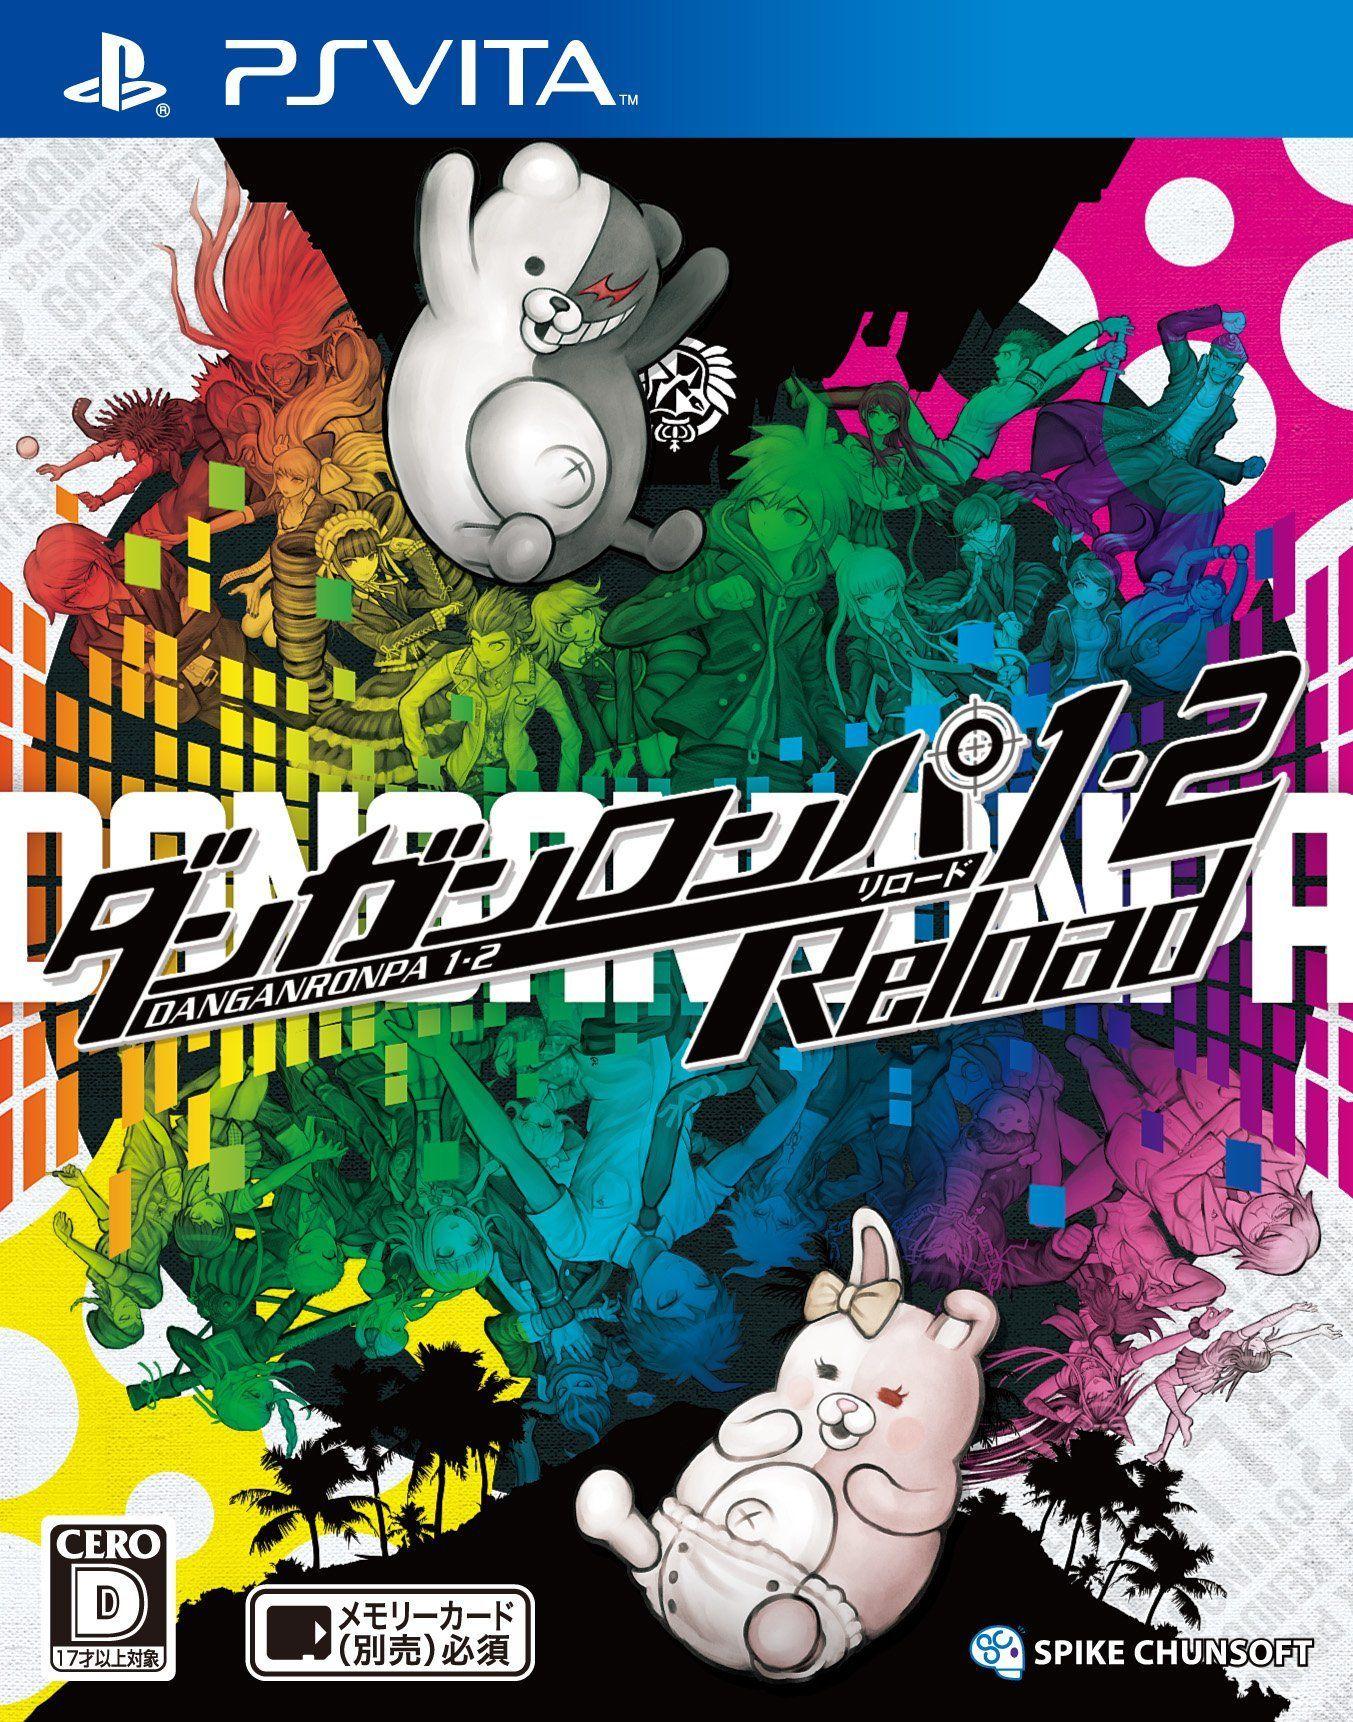 Fișier:Danganronpa 1.2 Reload Cover (Japanese).png